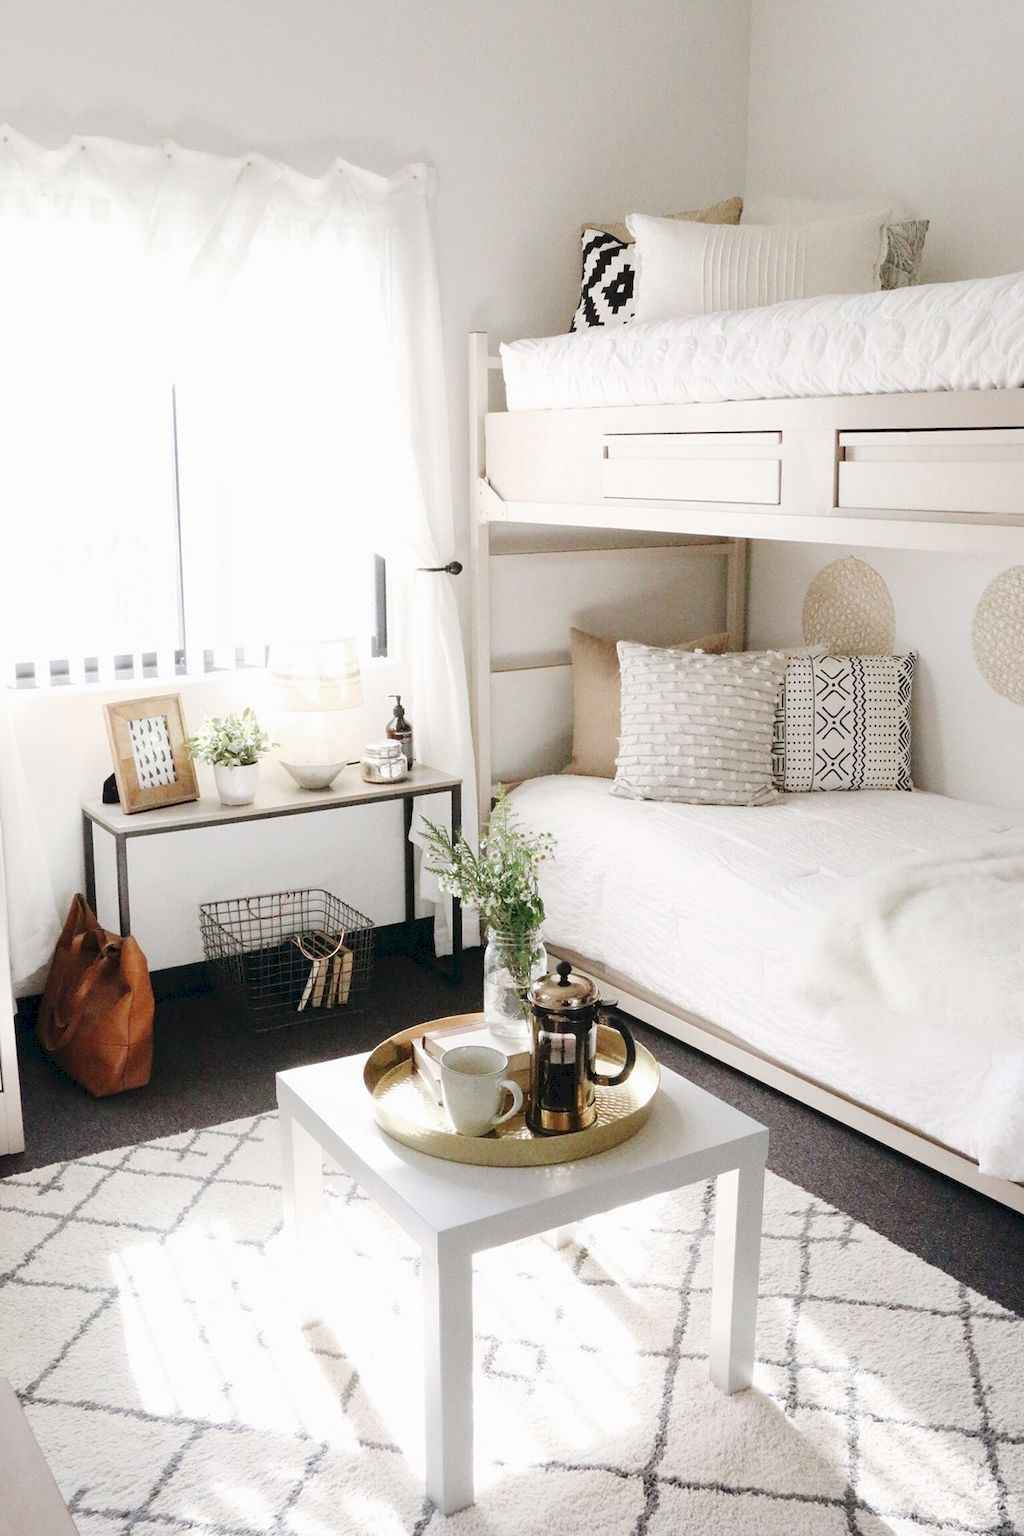 Cute diy dorm room decorating ideas on a budget (26)